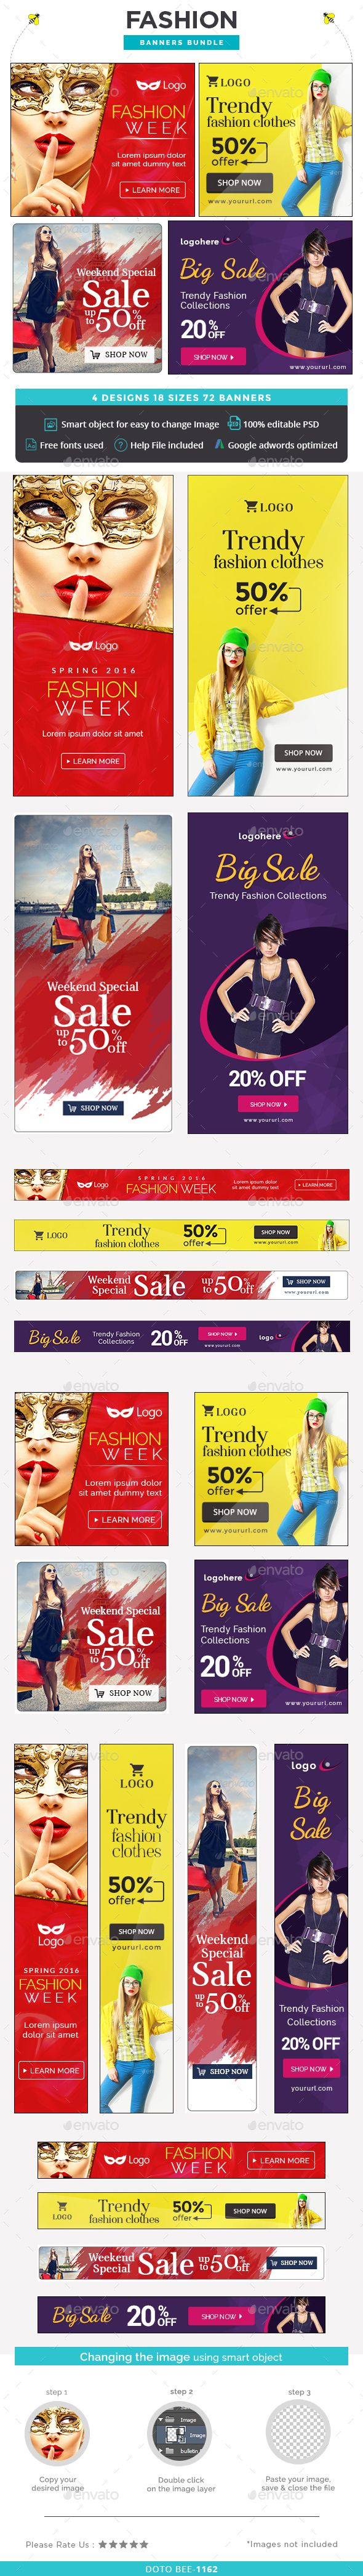 Fashion Web Banners Bundle - 4 Sets Template PSD. Download here: http://graphicriver.net/item/fashion-banners-bundle-4-sets/15015941?ref=ksioks